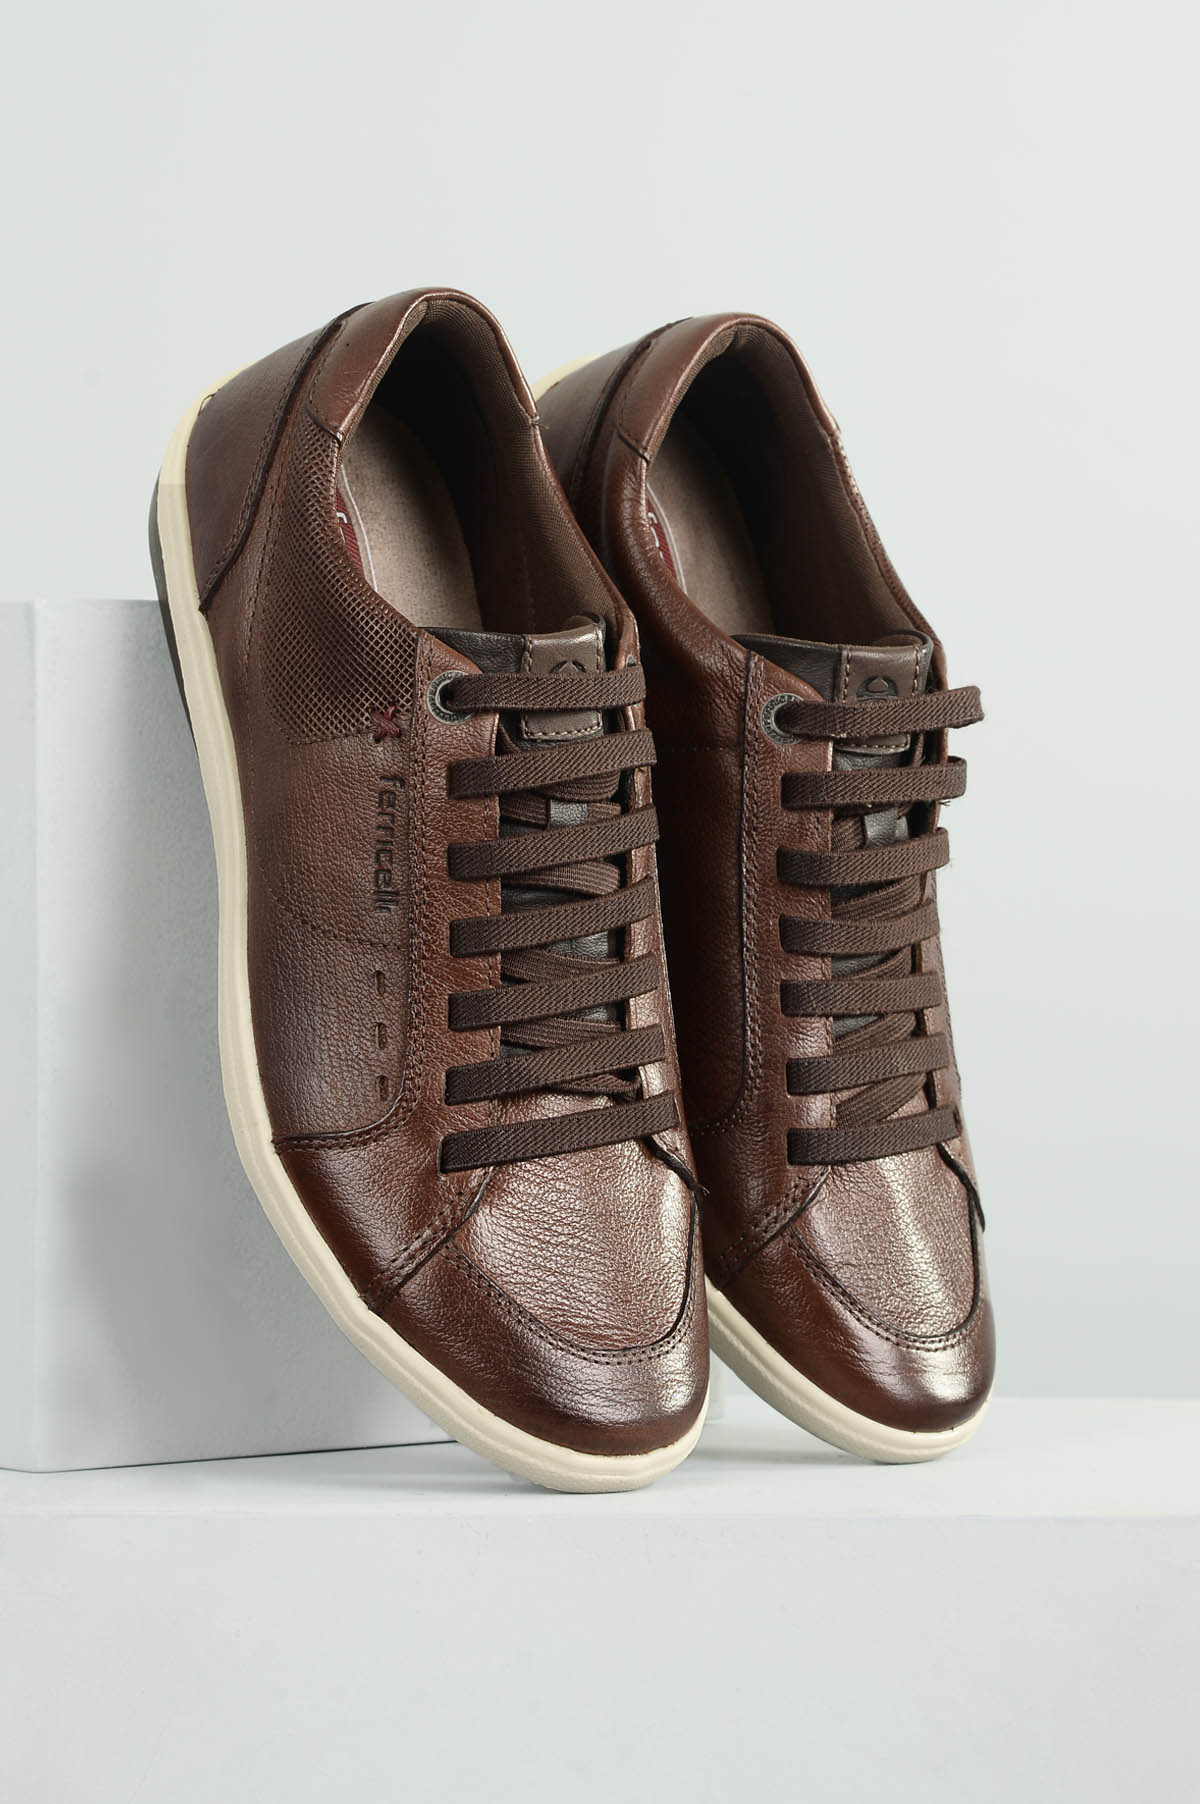 f1412a855 Sapatênis Masculino Ferricelli Wesley CR TAN - Mundial Calçados